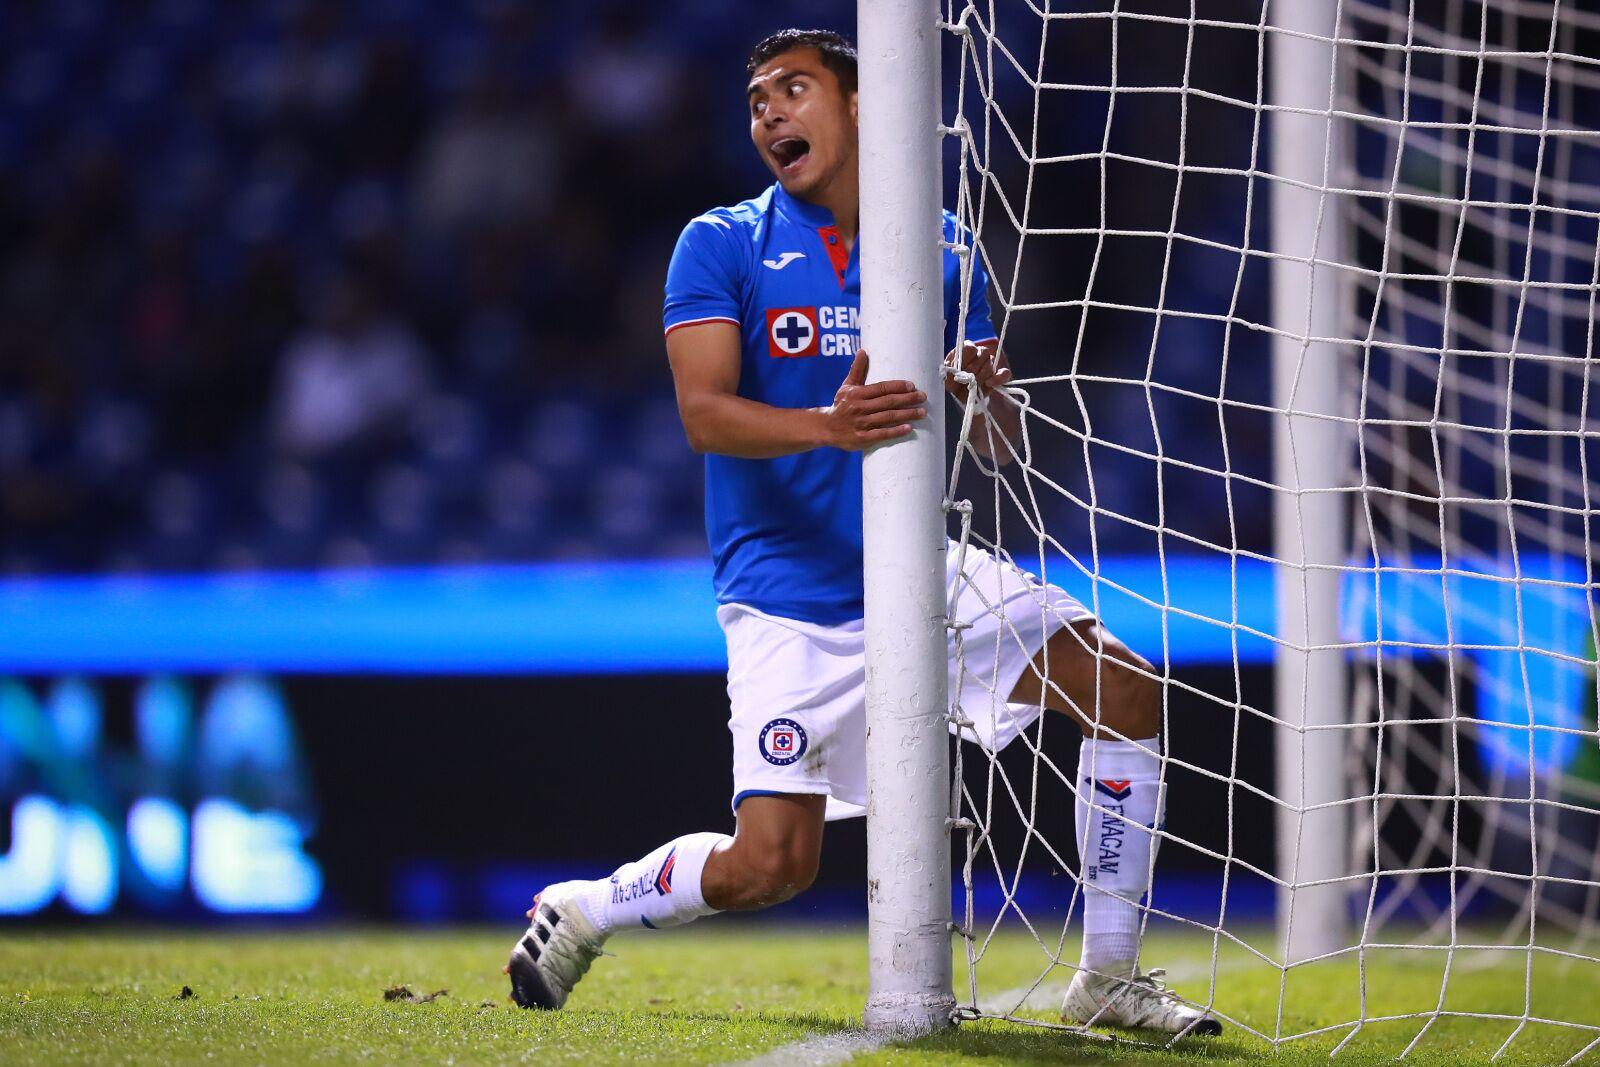 685883ac3d8 Toluca impresses in Liga MX opener; Puebla ties Cruz Azul